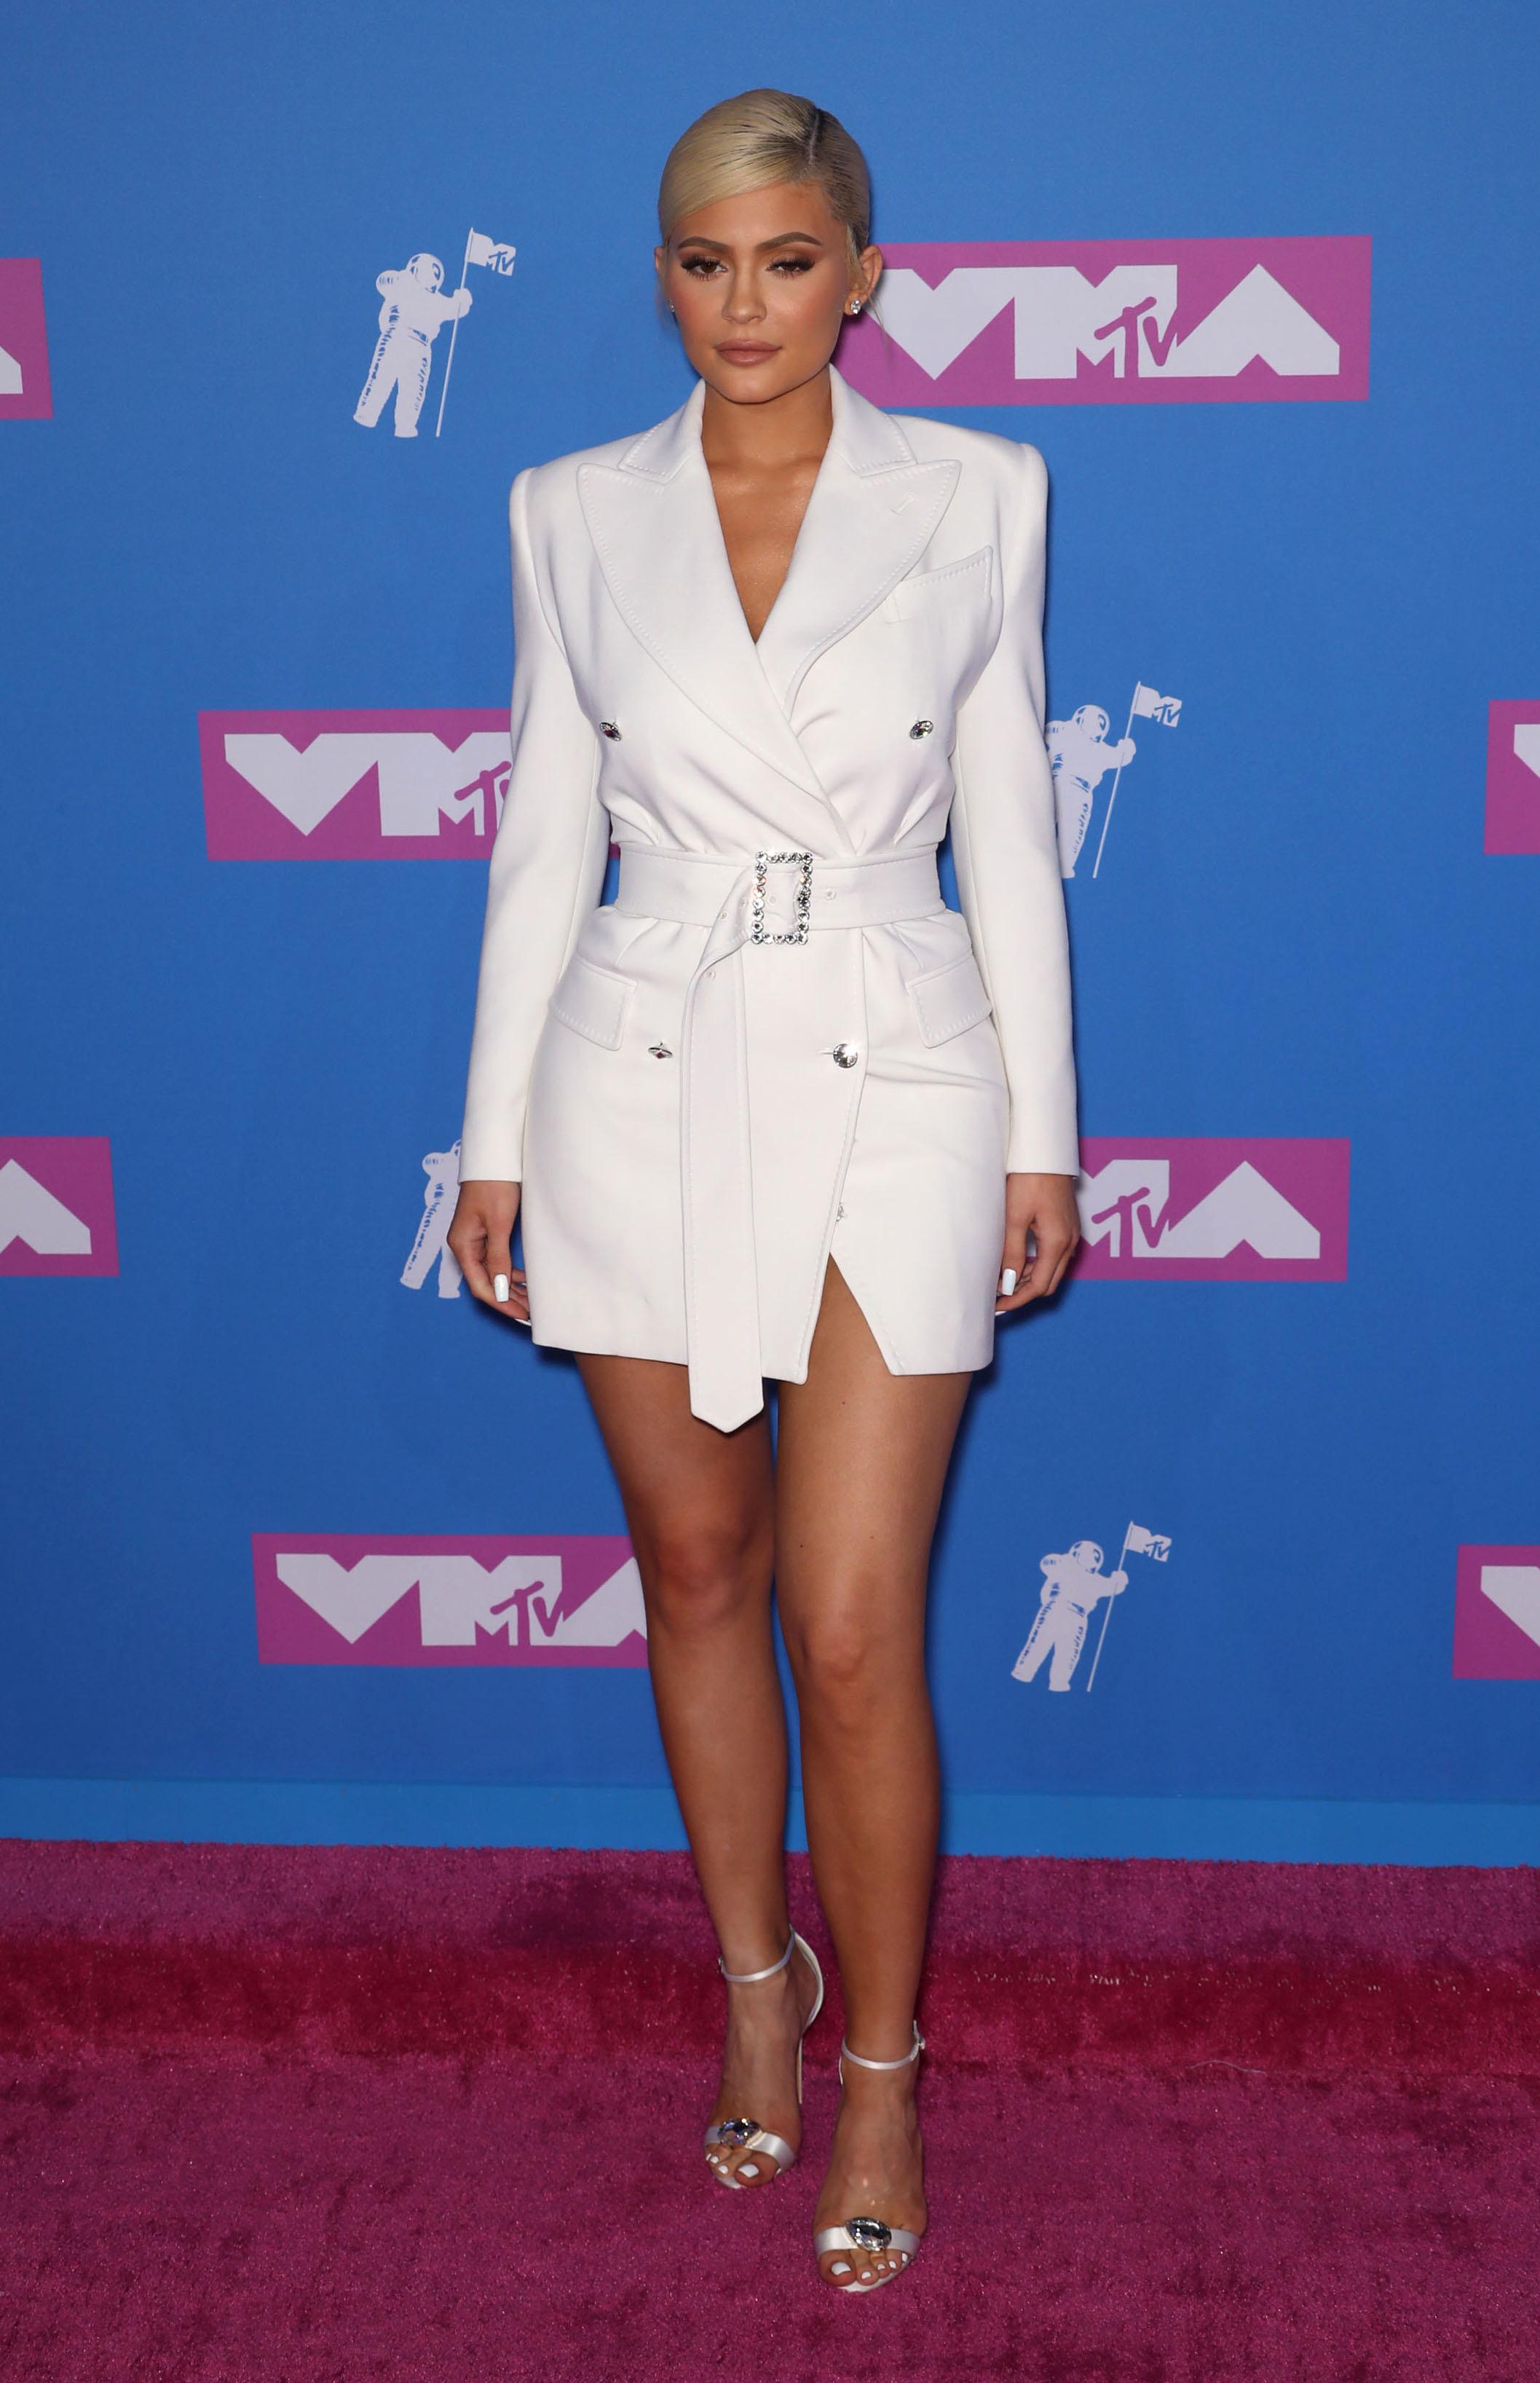 MTV Video Music Awards 2018 in New York City